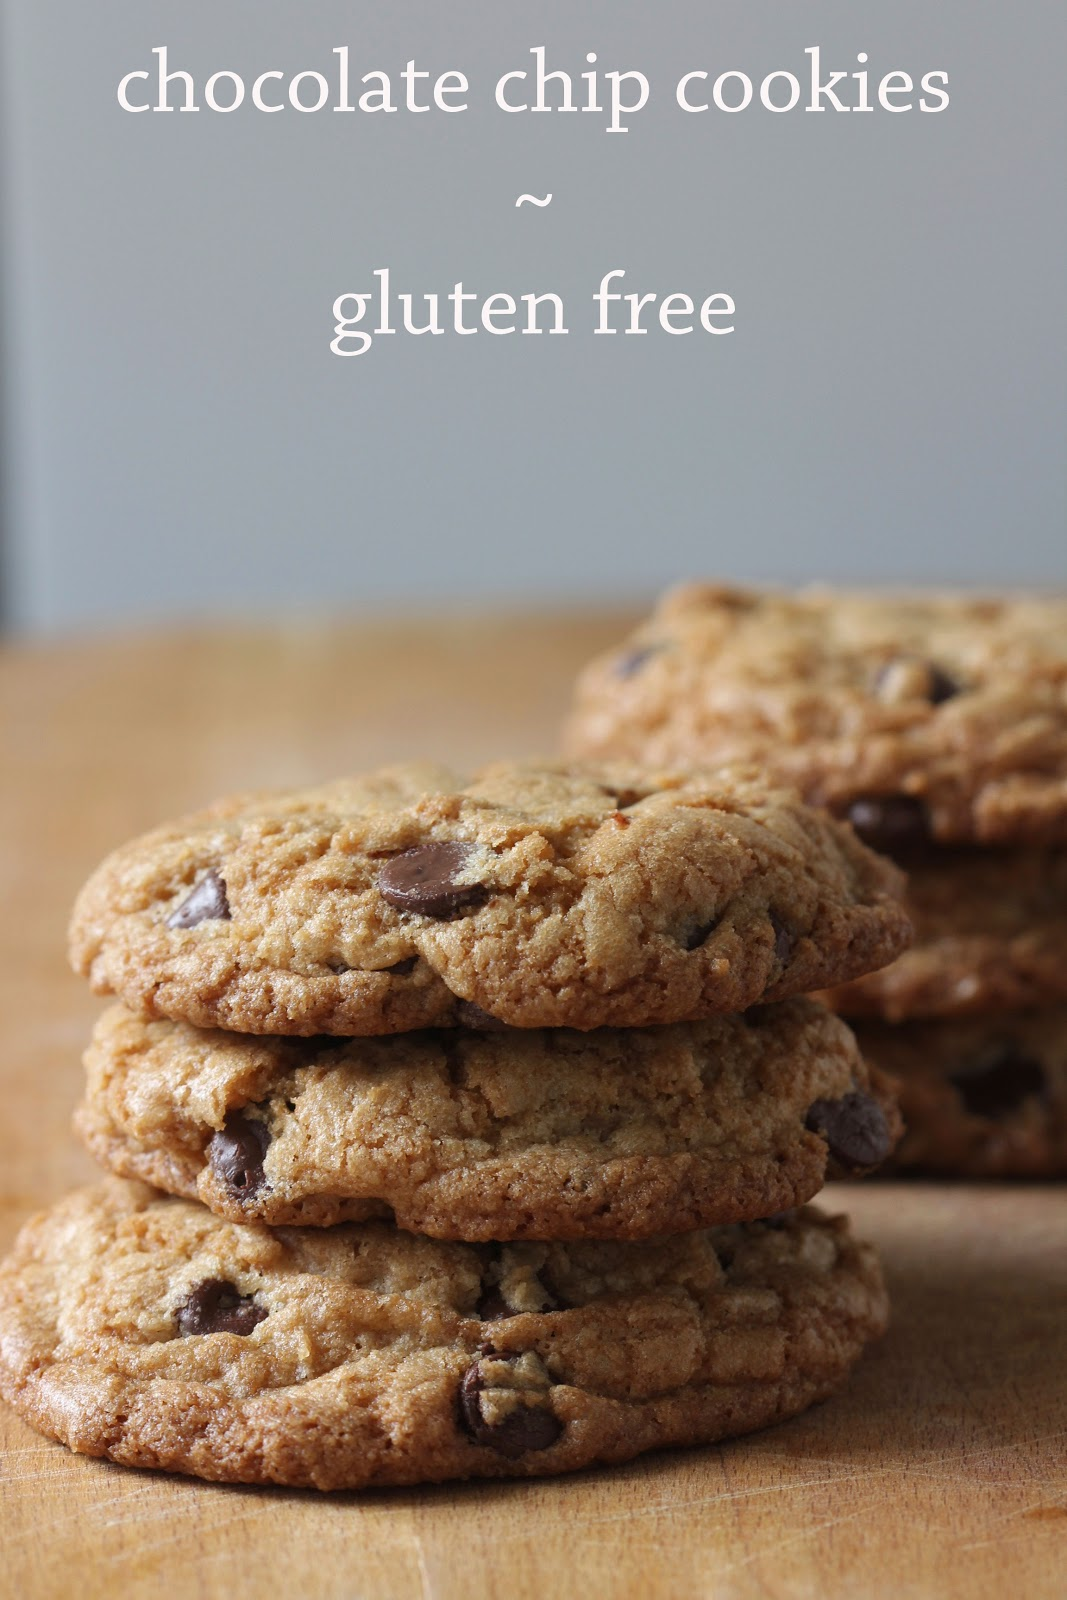 Chocolate Chip Cookies, Gluten Free | Ridgely's Radar